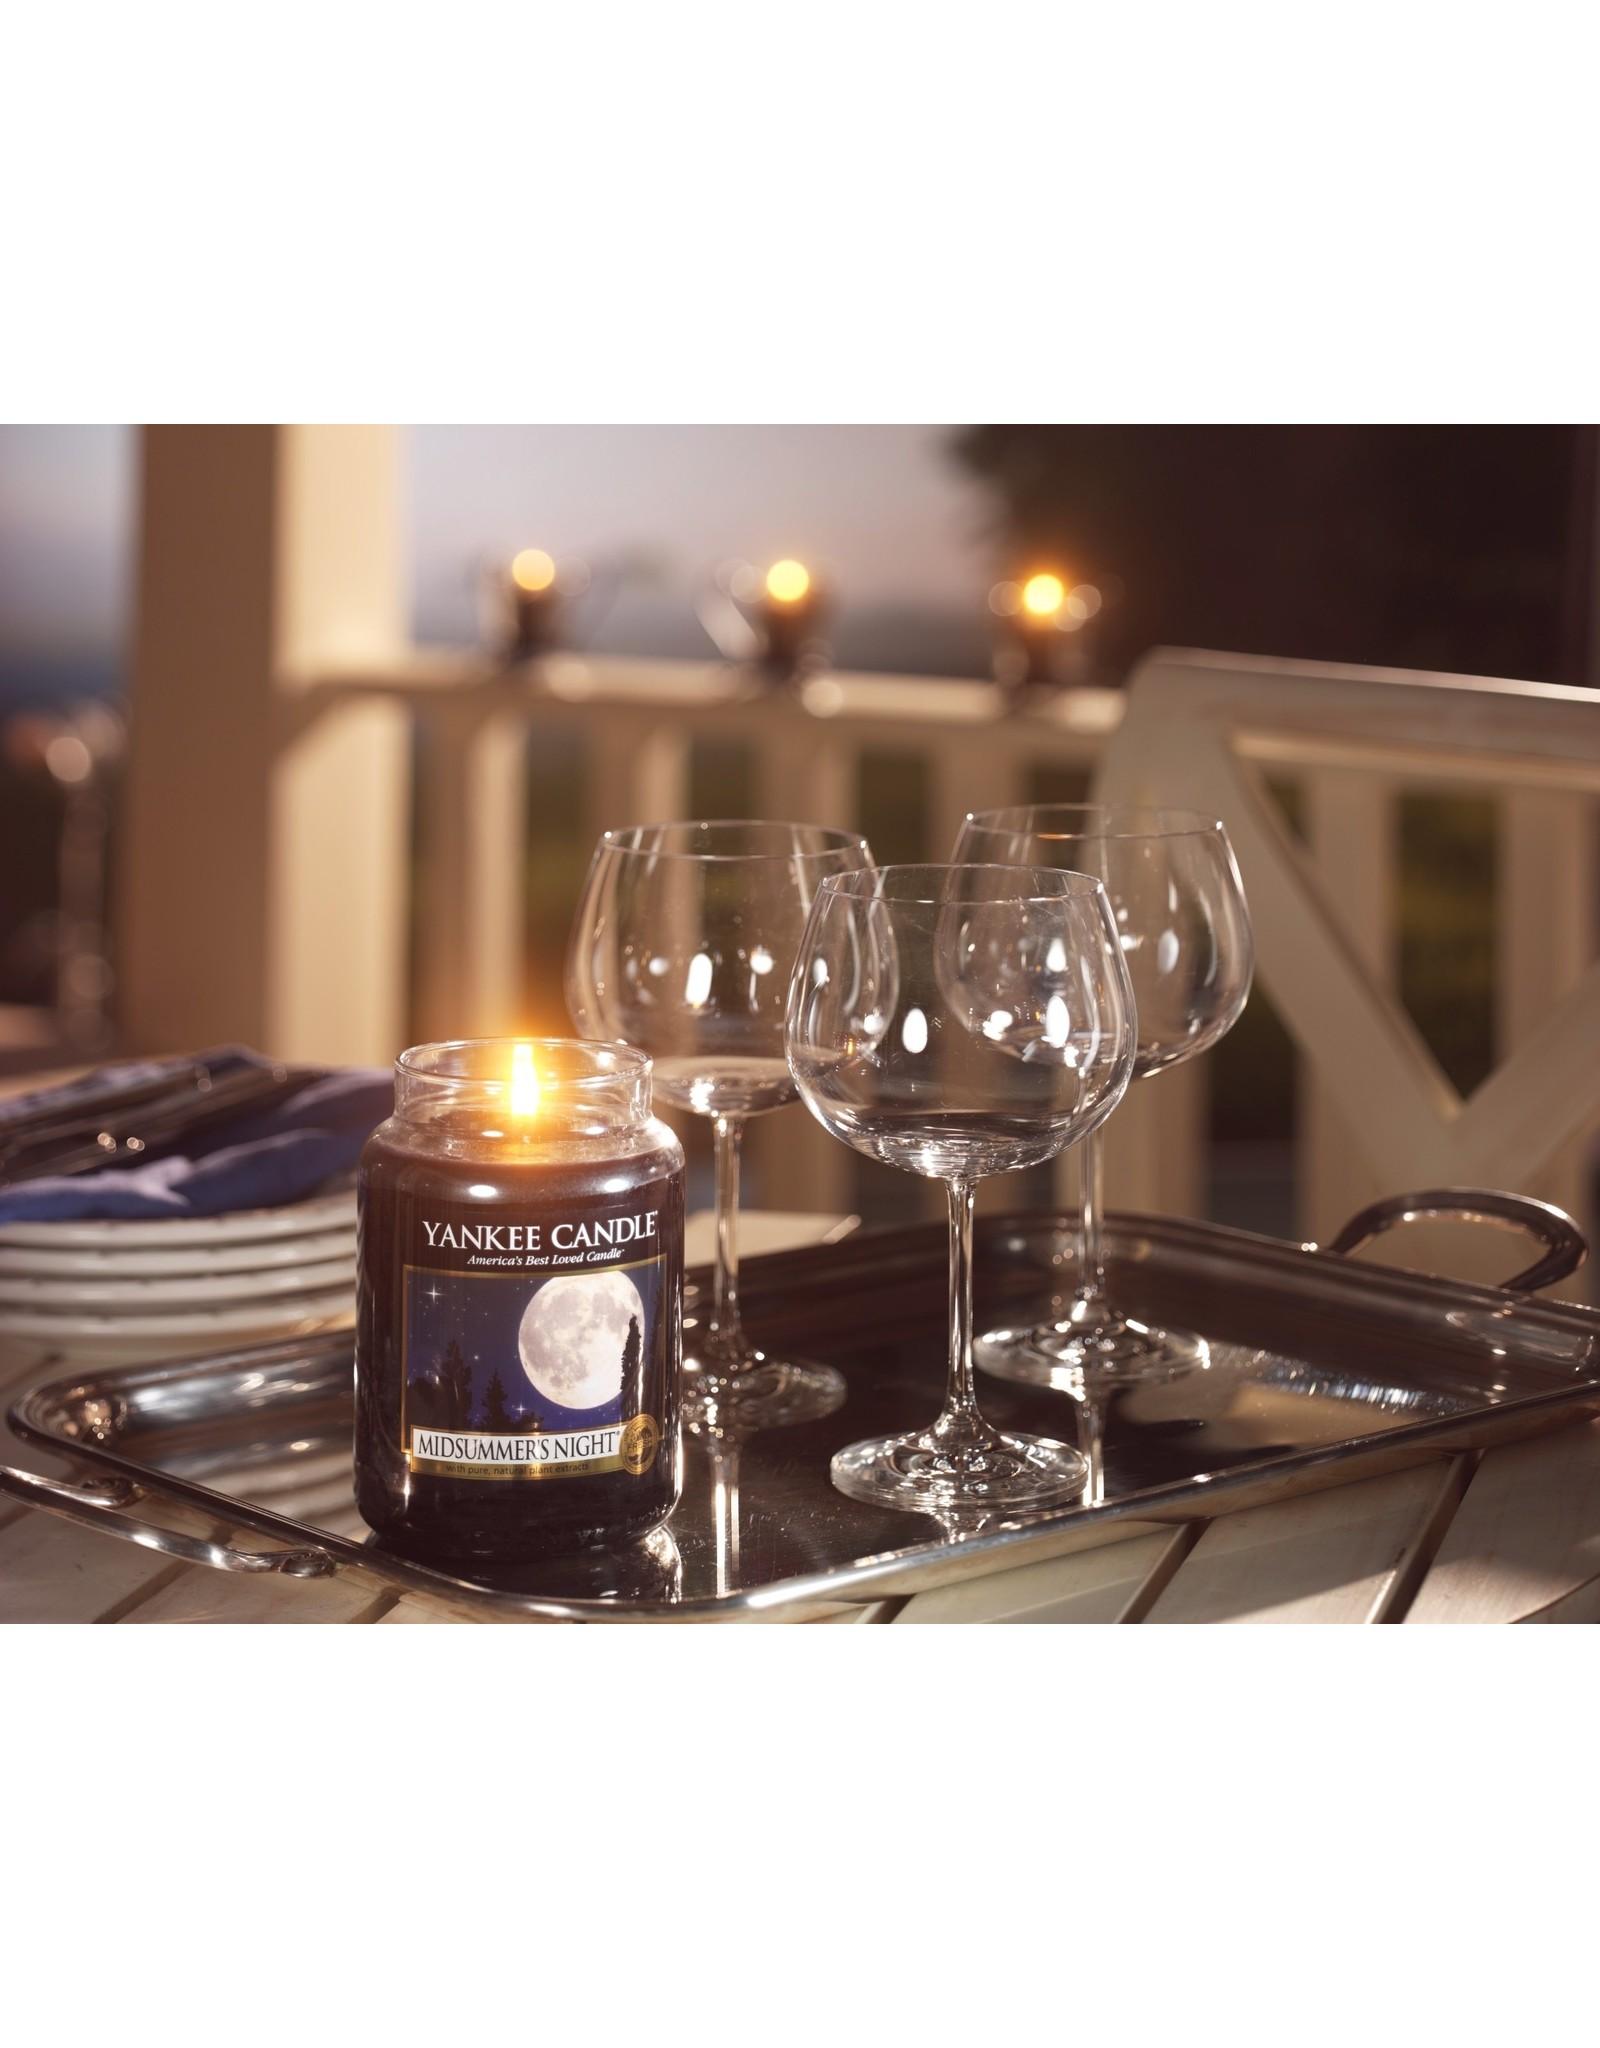 Yankee Candle Midsummer's Night Large Jar